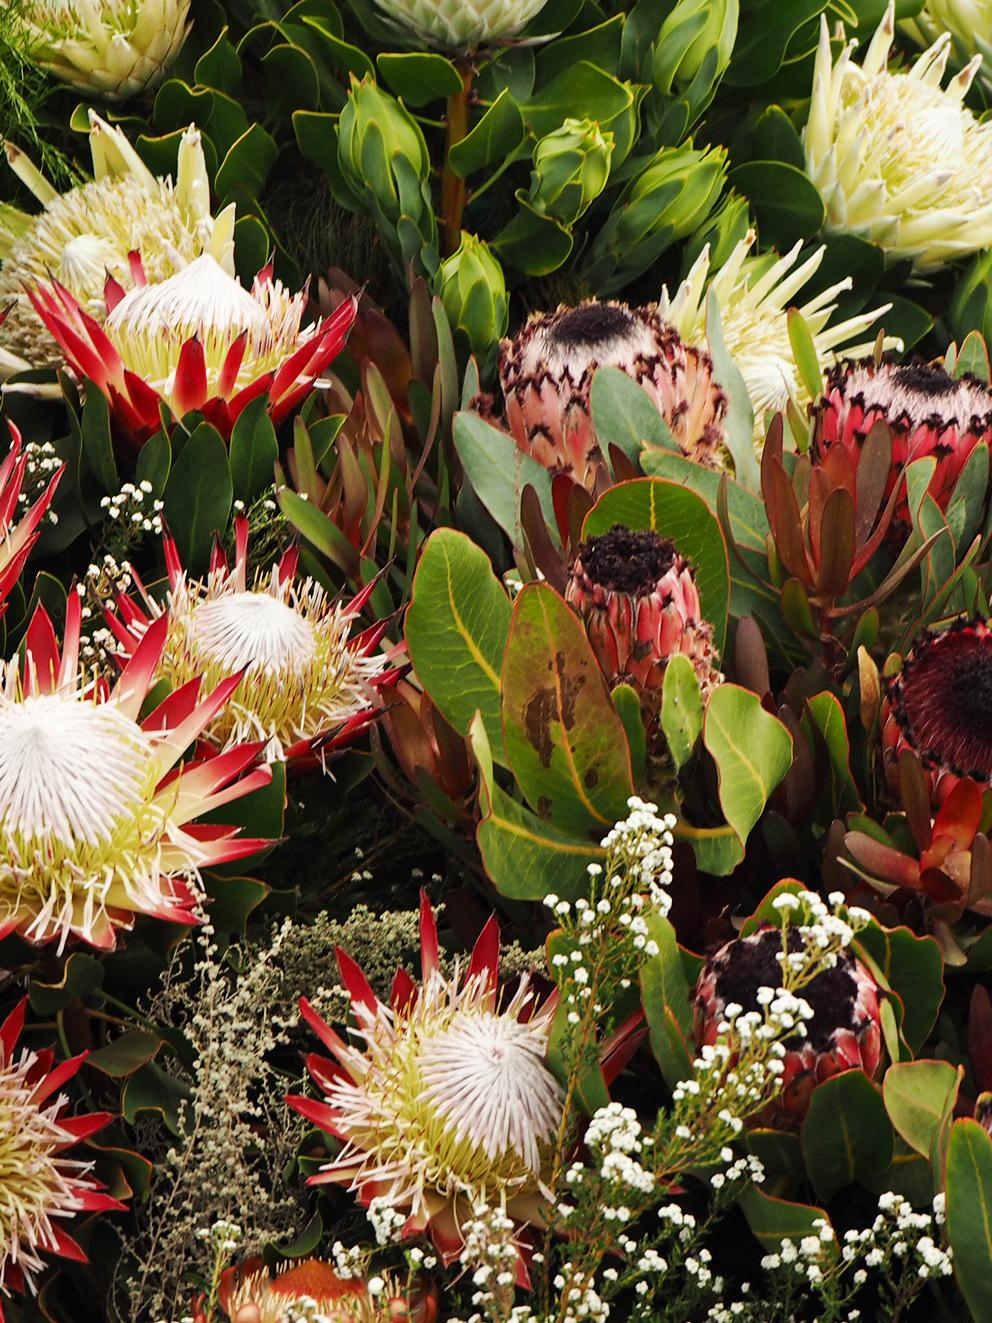 French For Pineapple Blog - RHS Chelsea Flower Show 2017 - protea garden